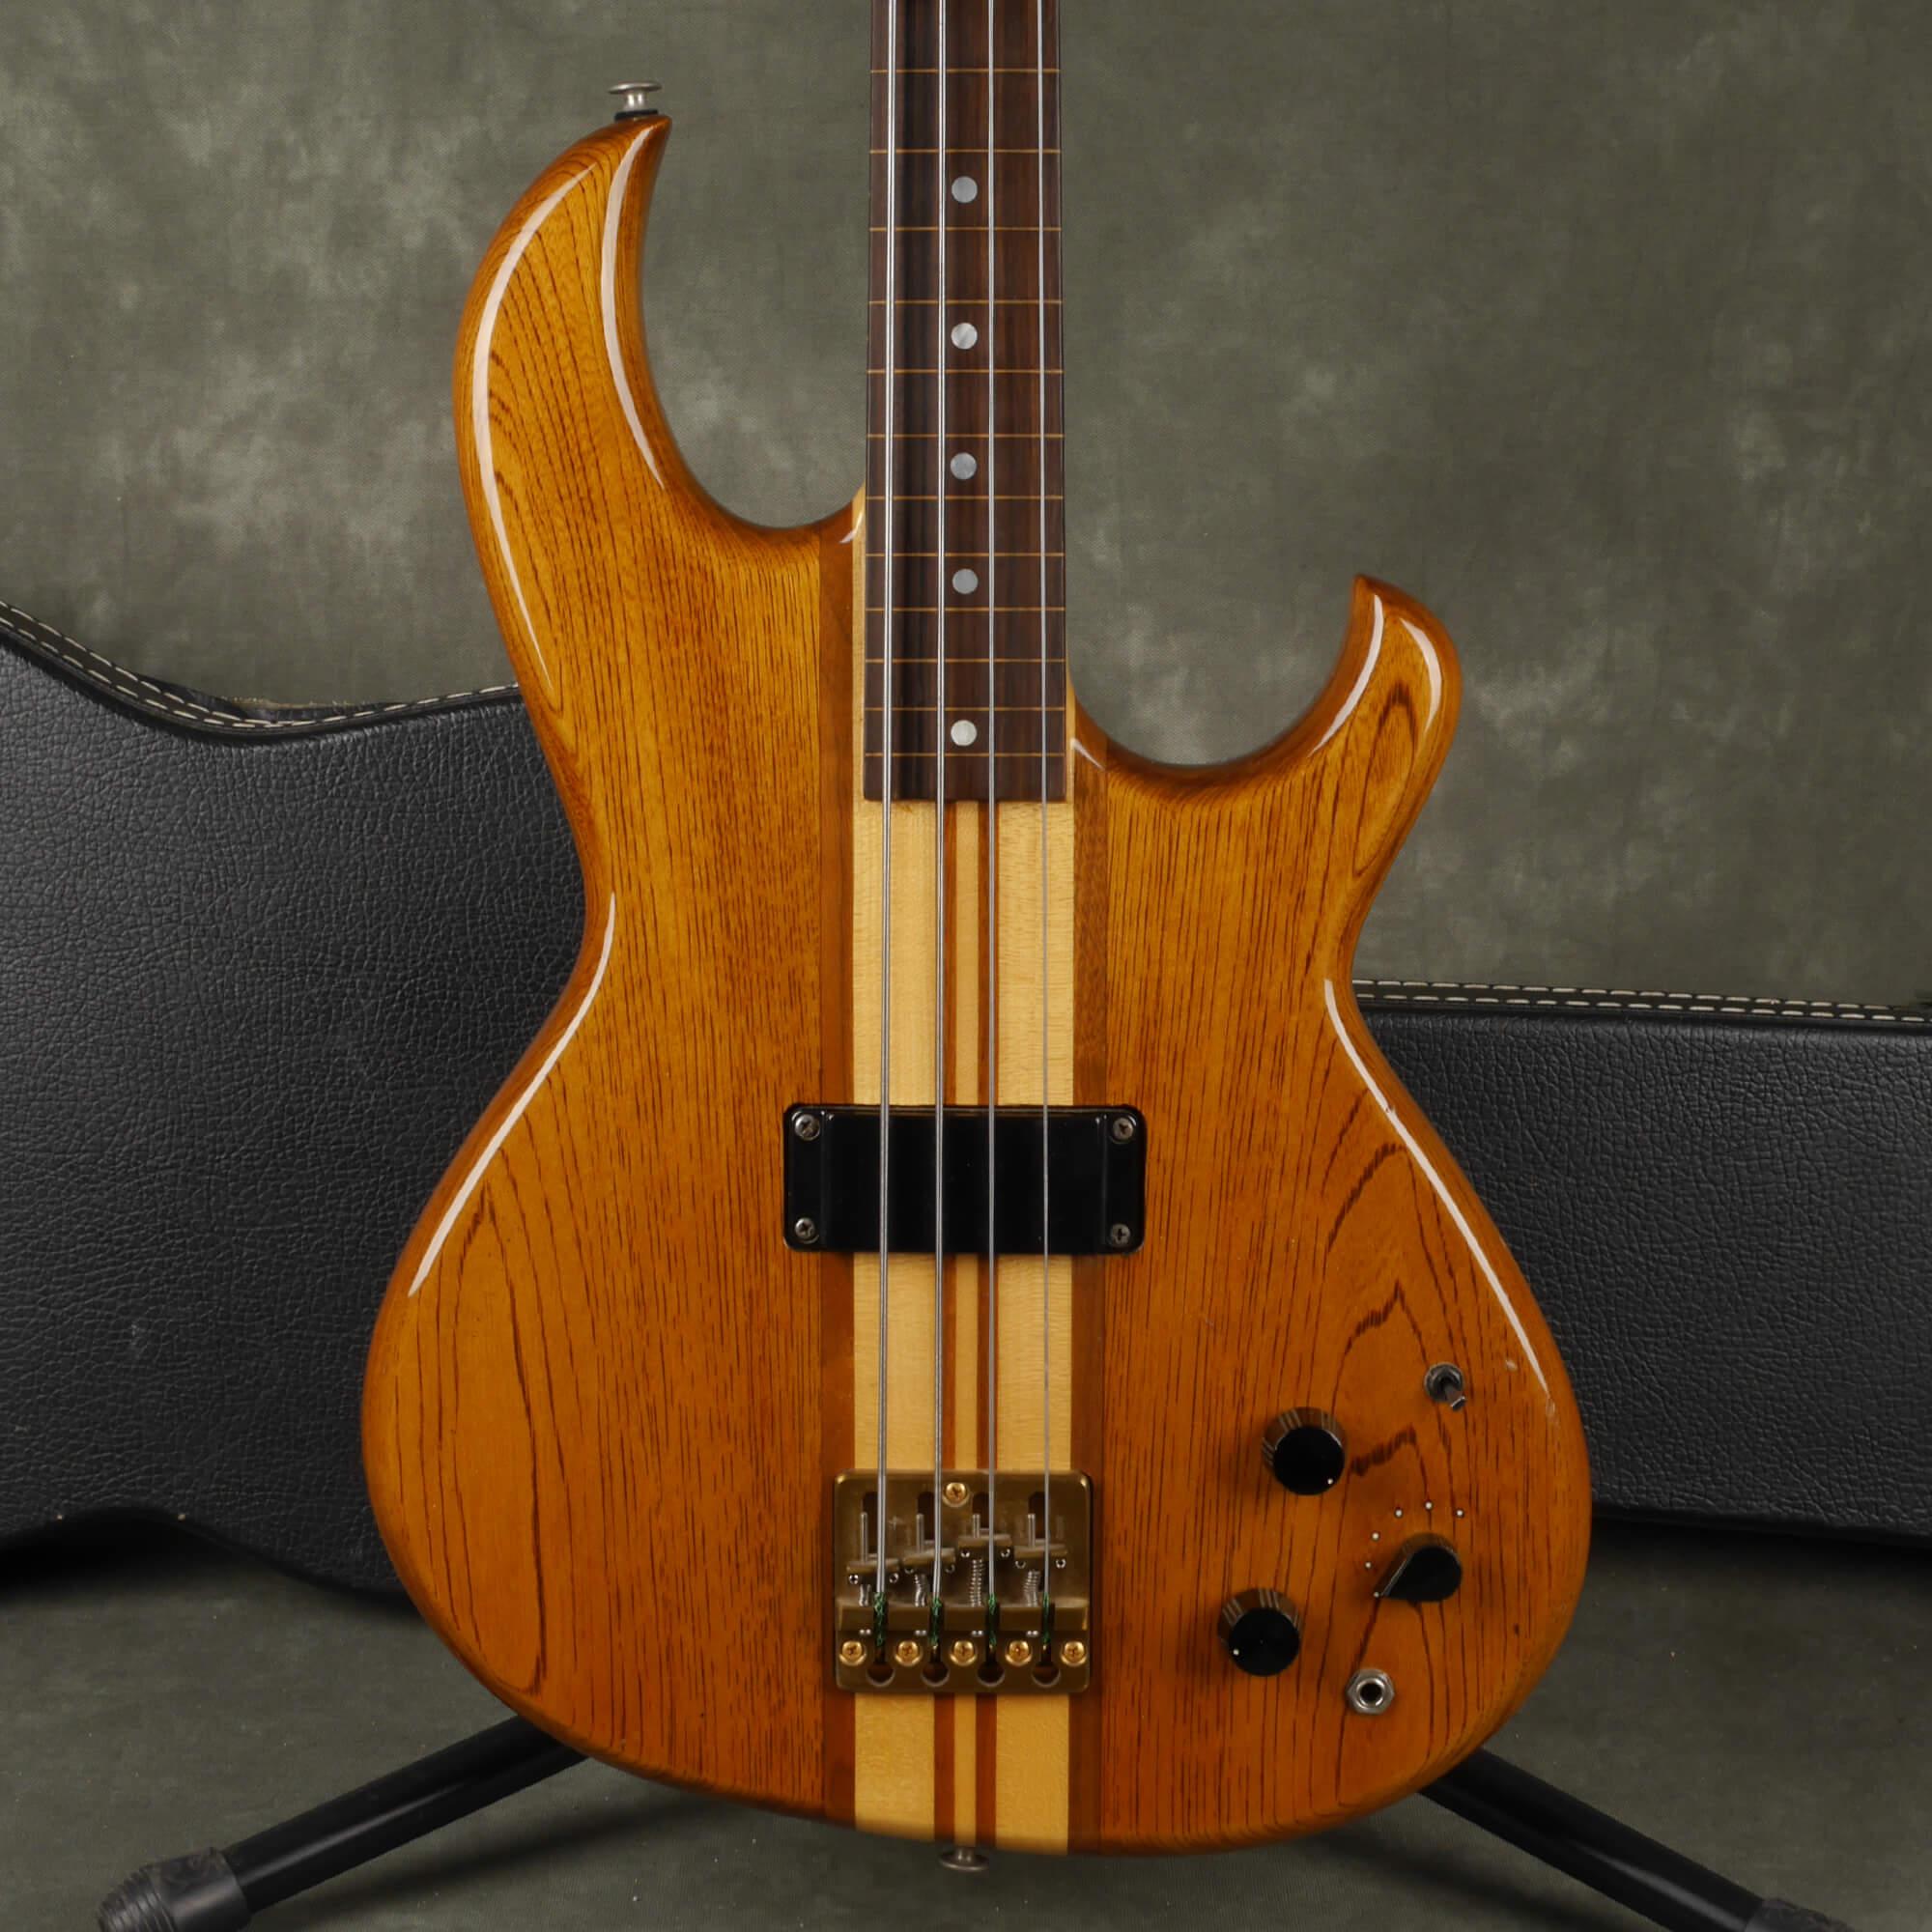 Aria Pro II SB-1000 Fretless Bass Guitar - Natural w/Hard Case - 2nd Hand